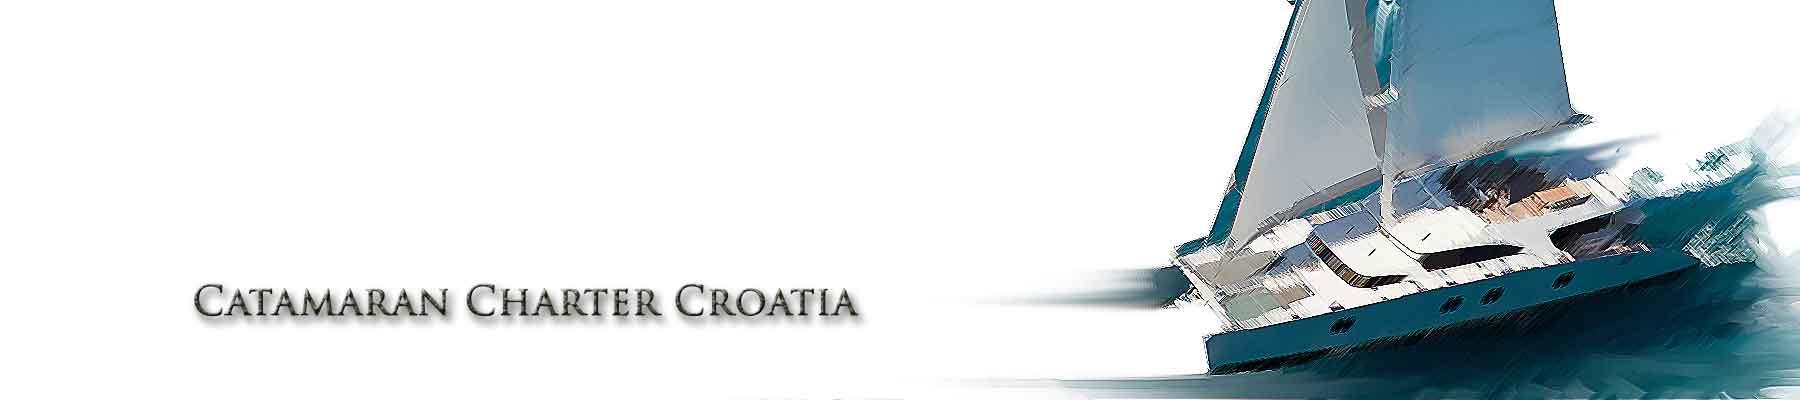 Catamaran Charter Croatia selection